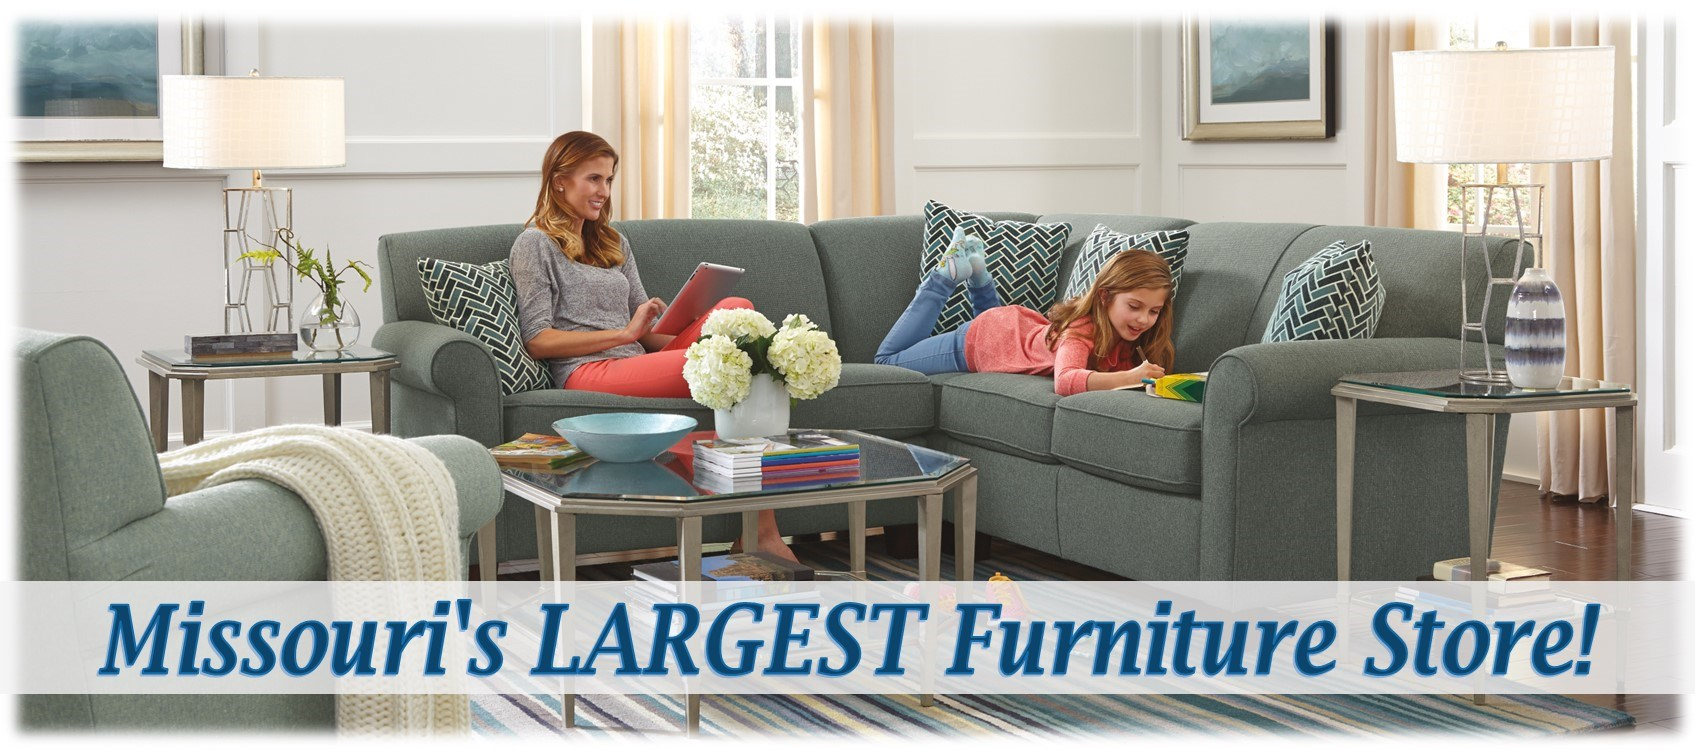 Arwood's is Missouri's LARGEST Furniture Store!